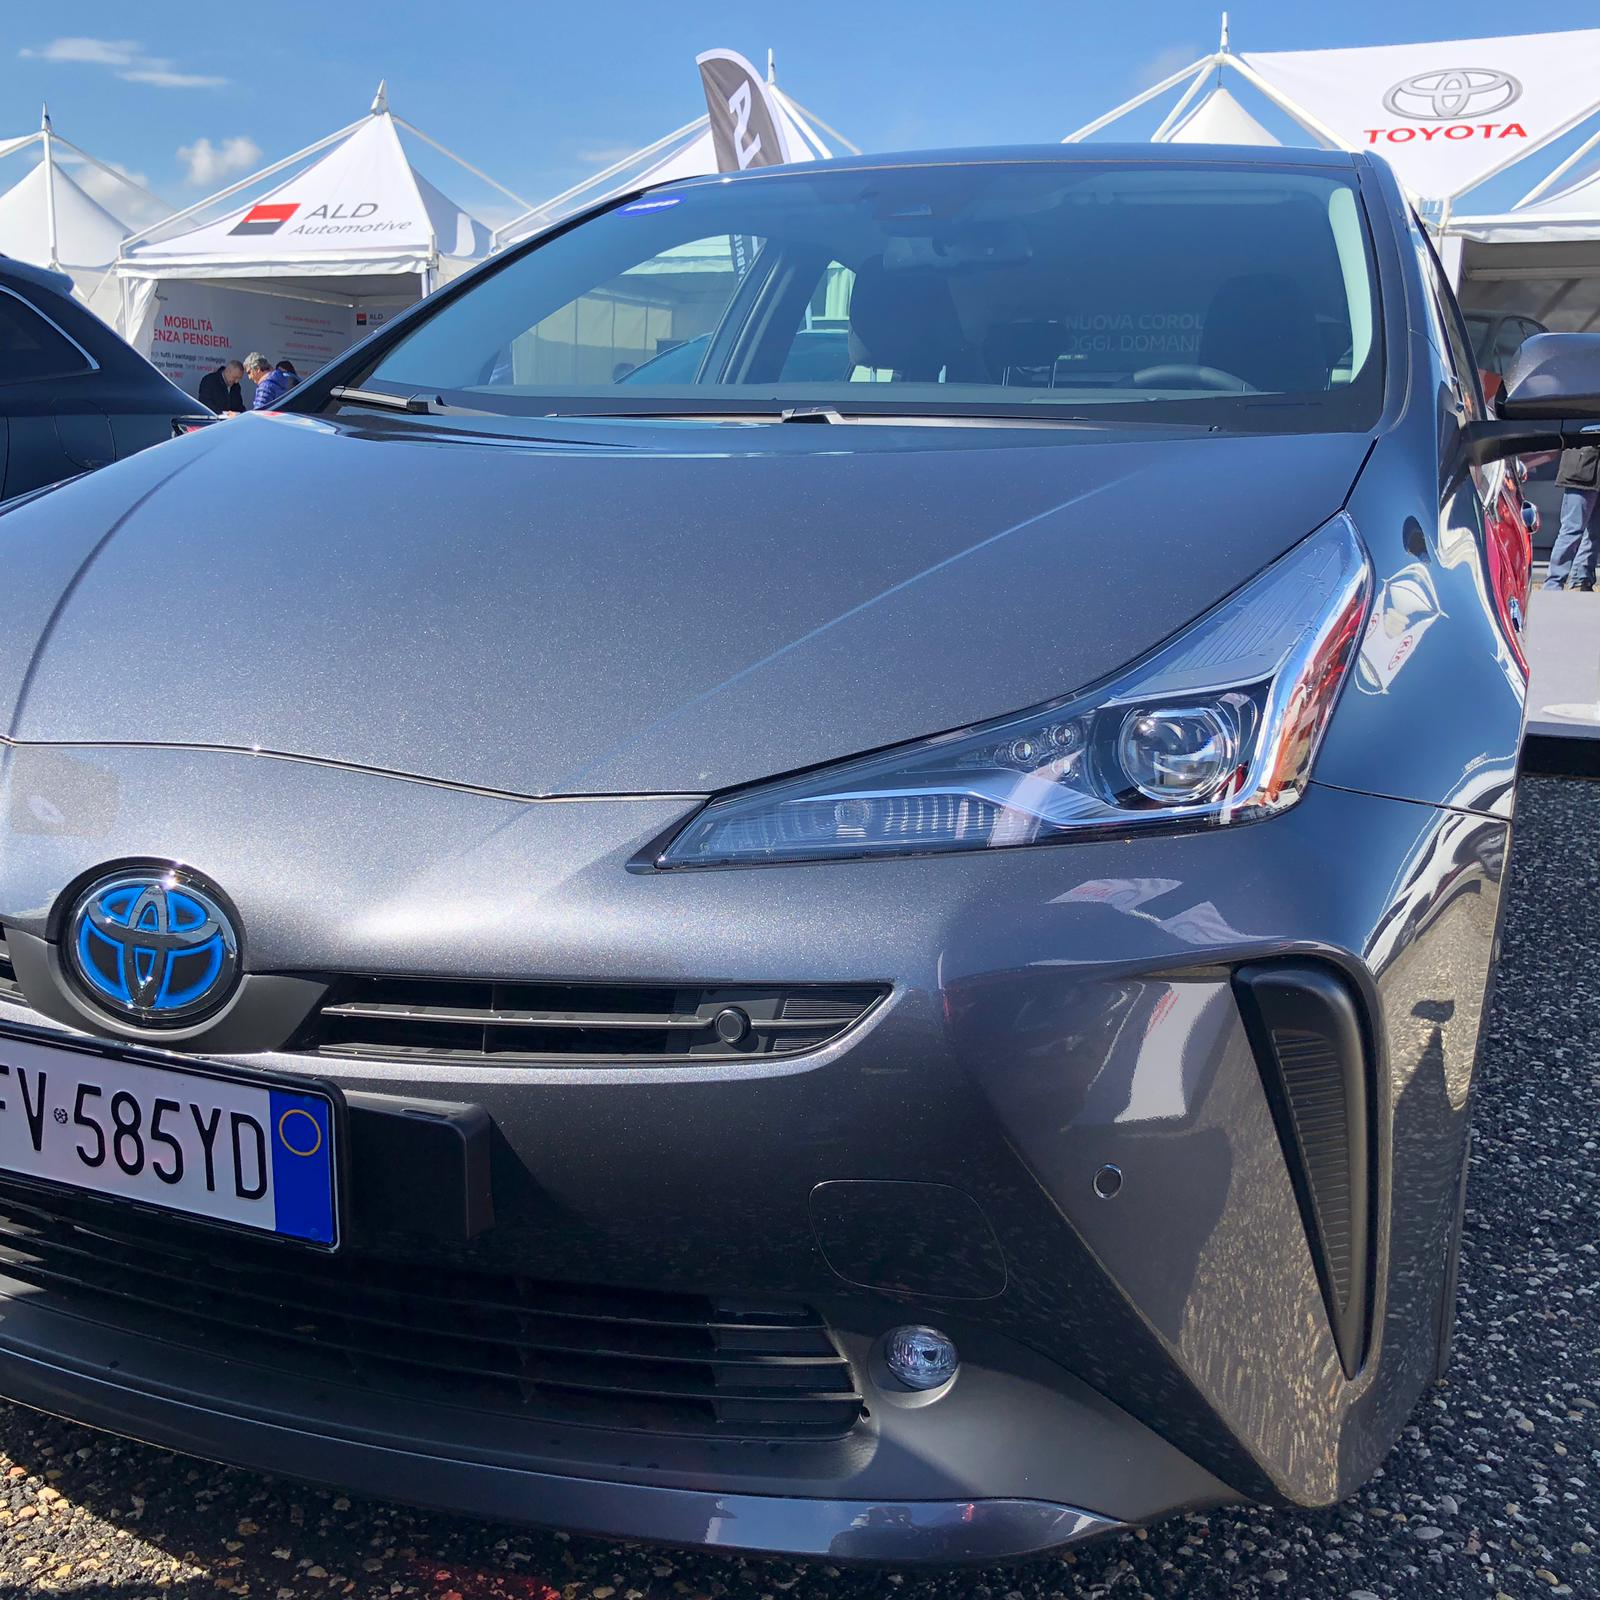 toyota-prius-anteprima-fleet-motor-day-2019